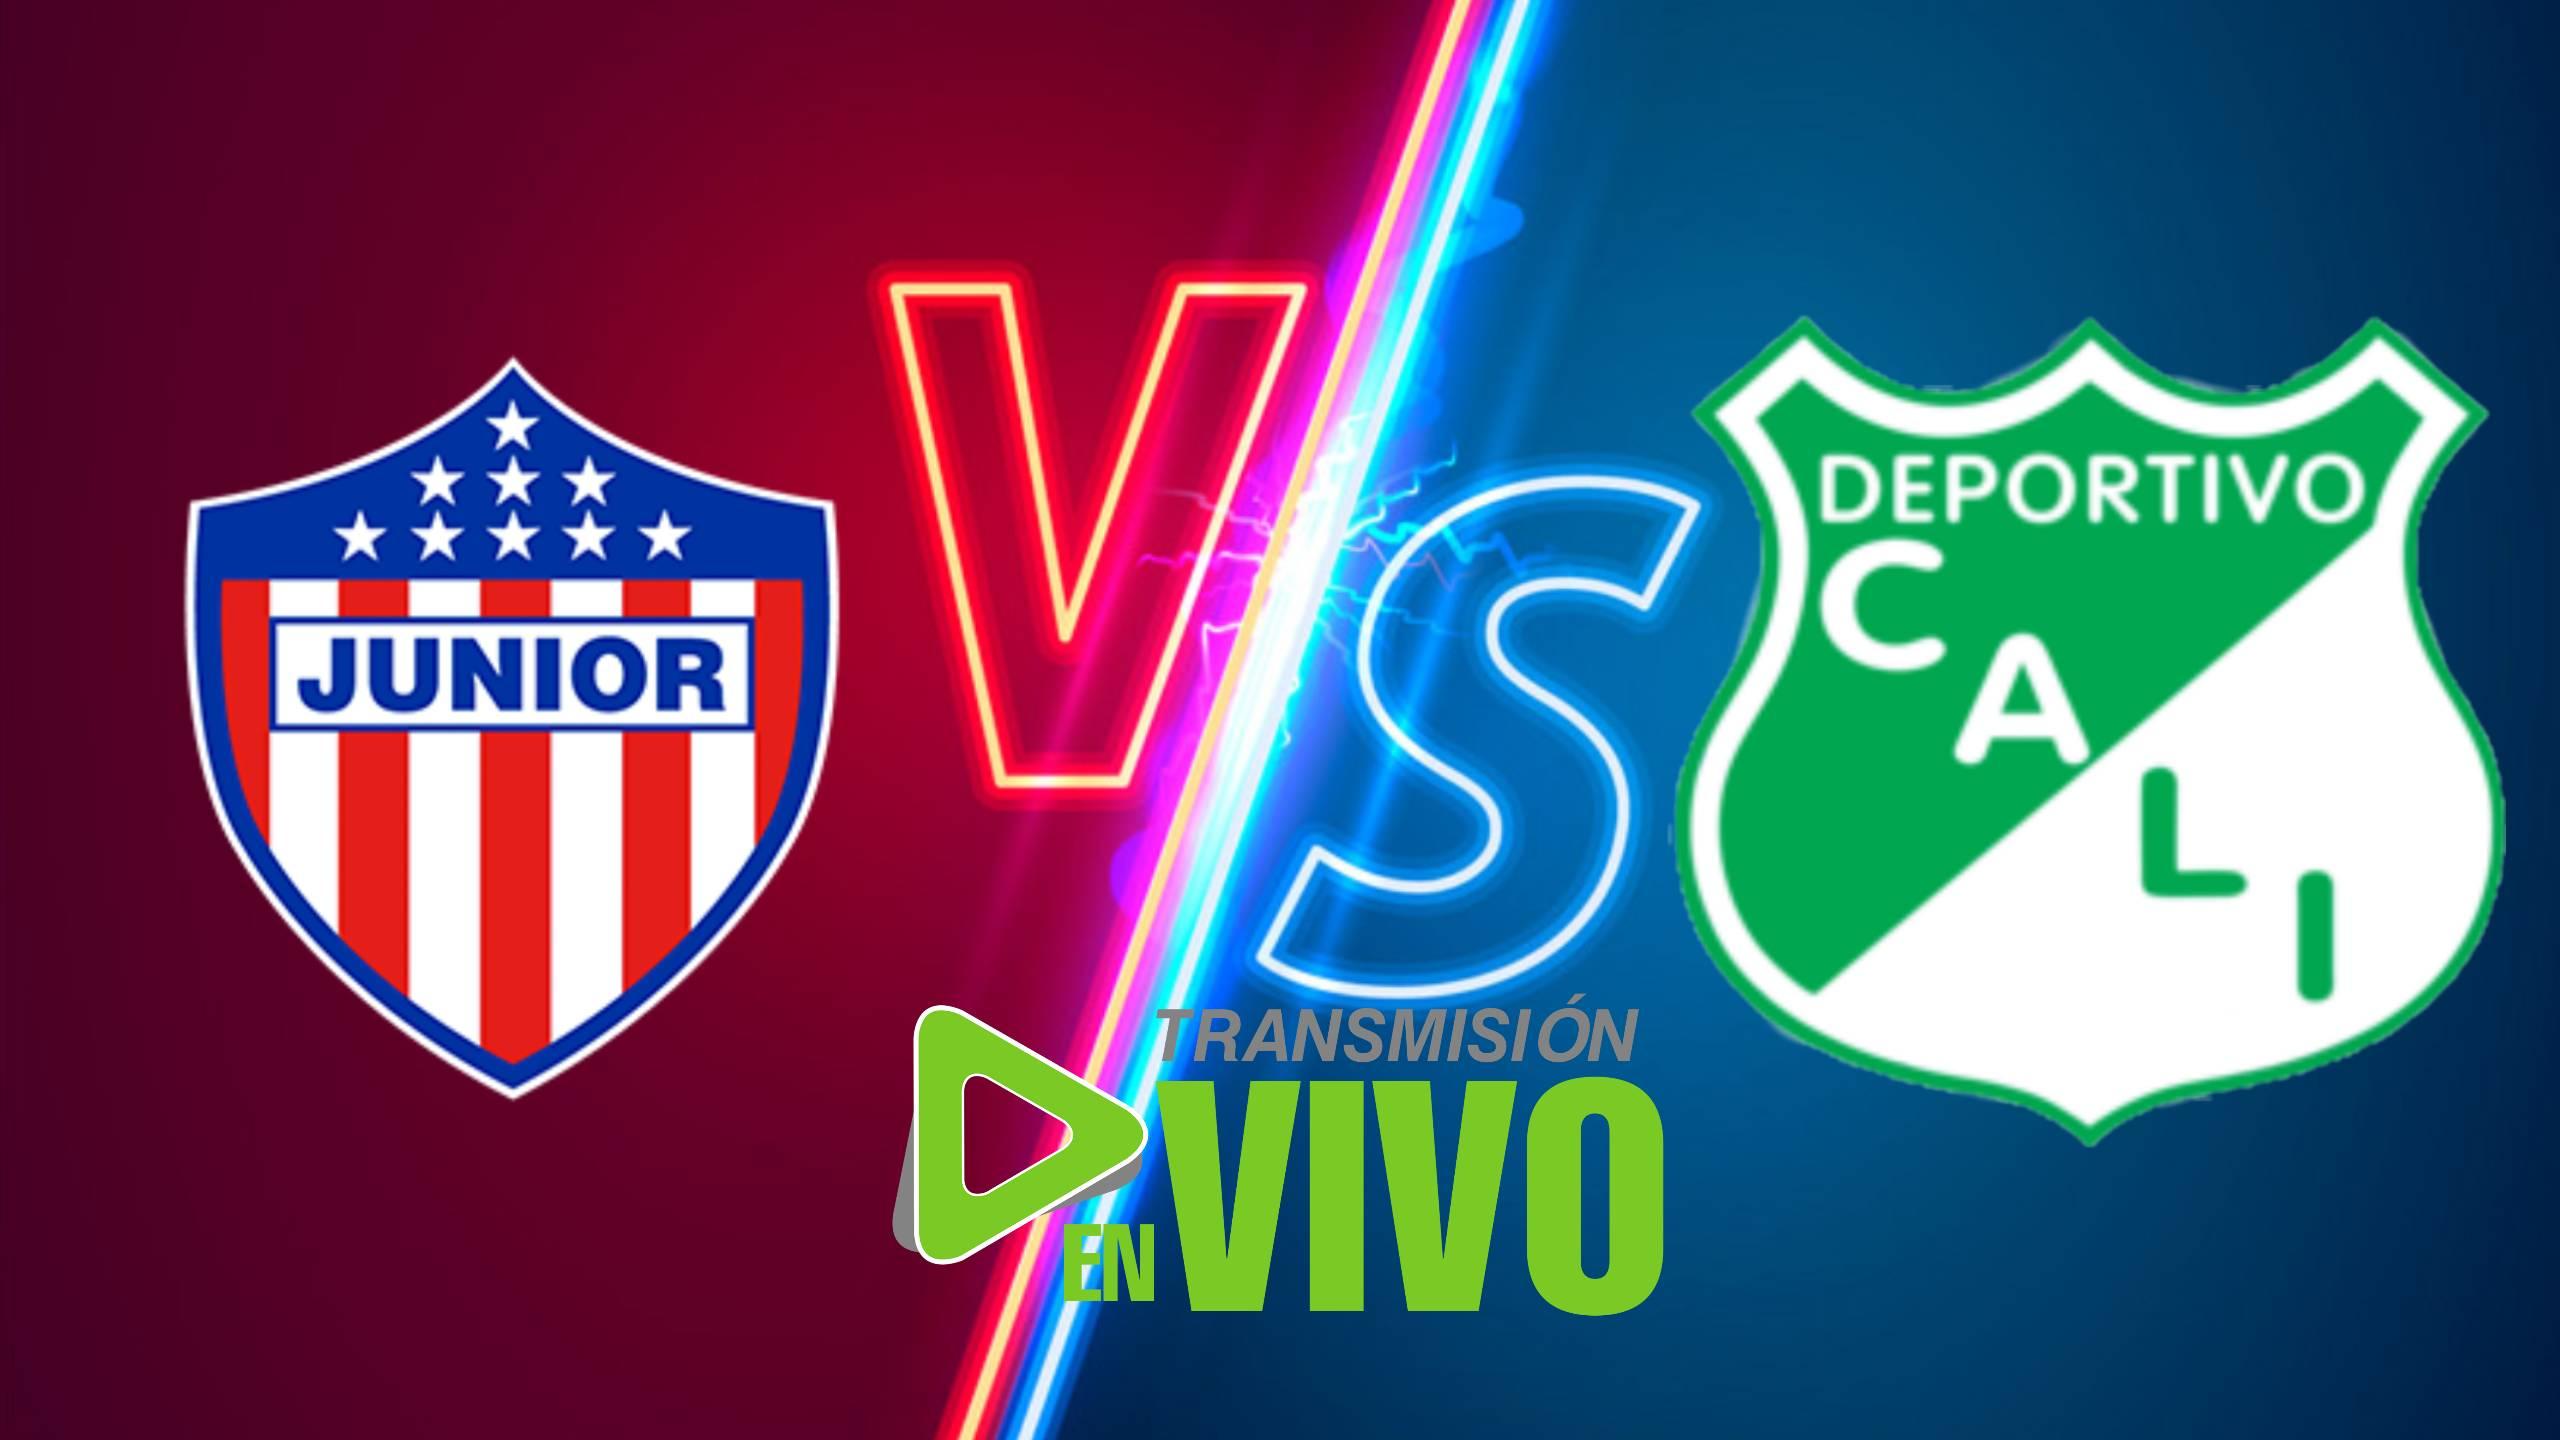 Junior vs Deportivo Cali EN VIVO ONLINE POR LA LIGA BETPLAY 2021